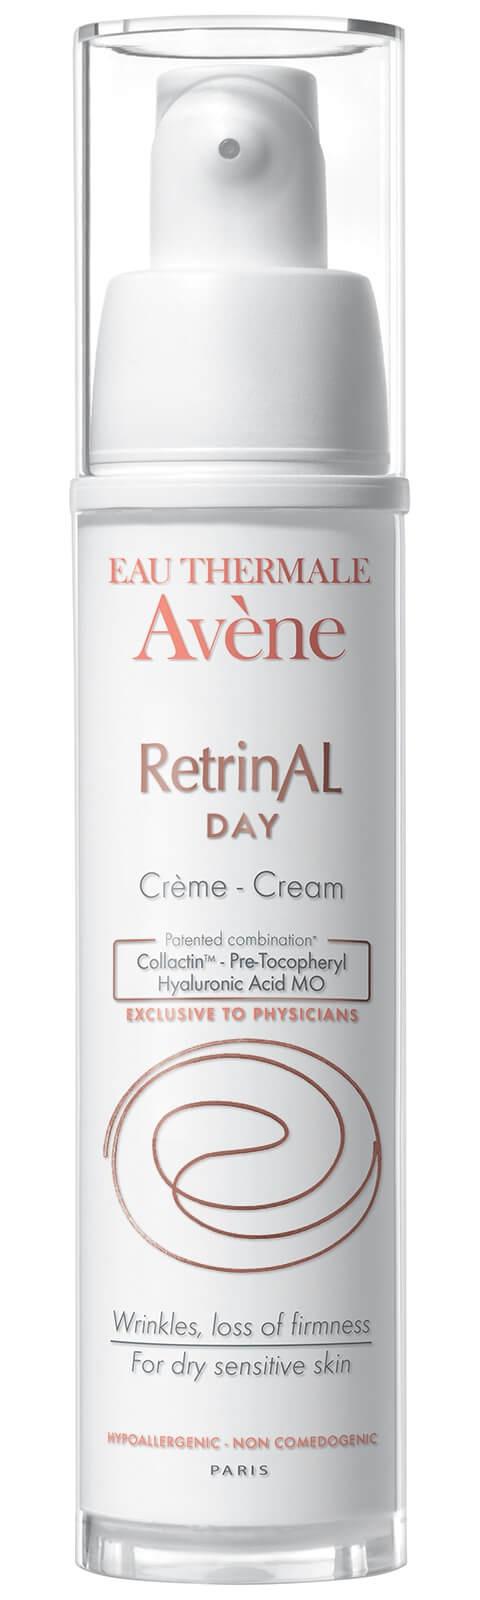 Avene RetrinAL Day Cream